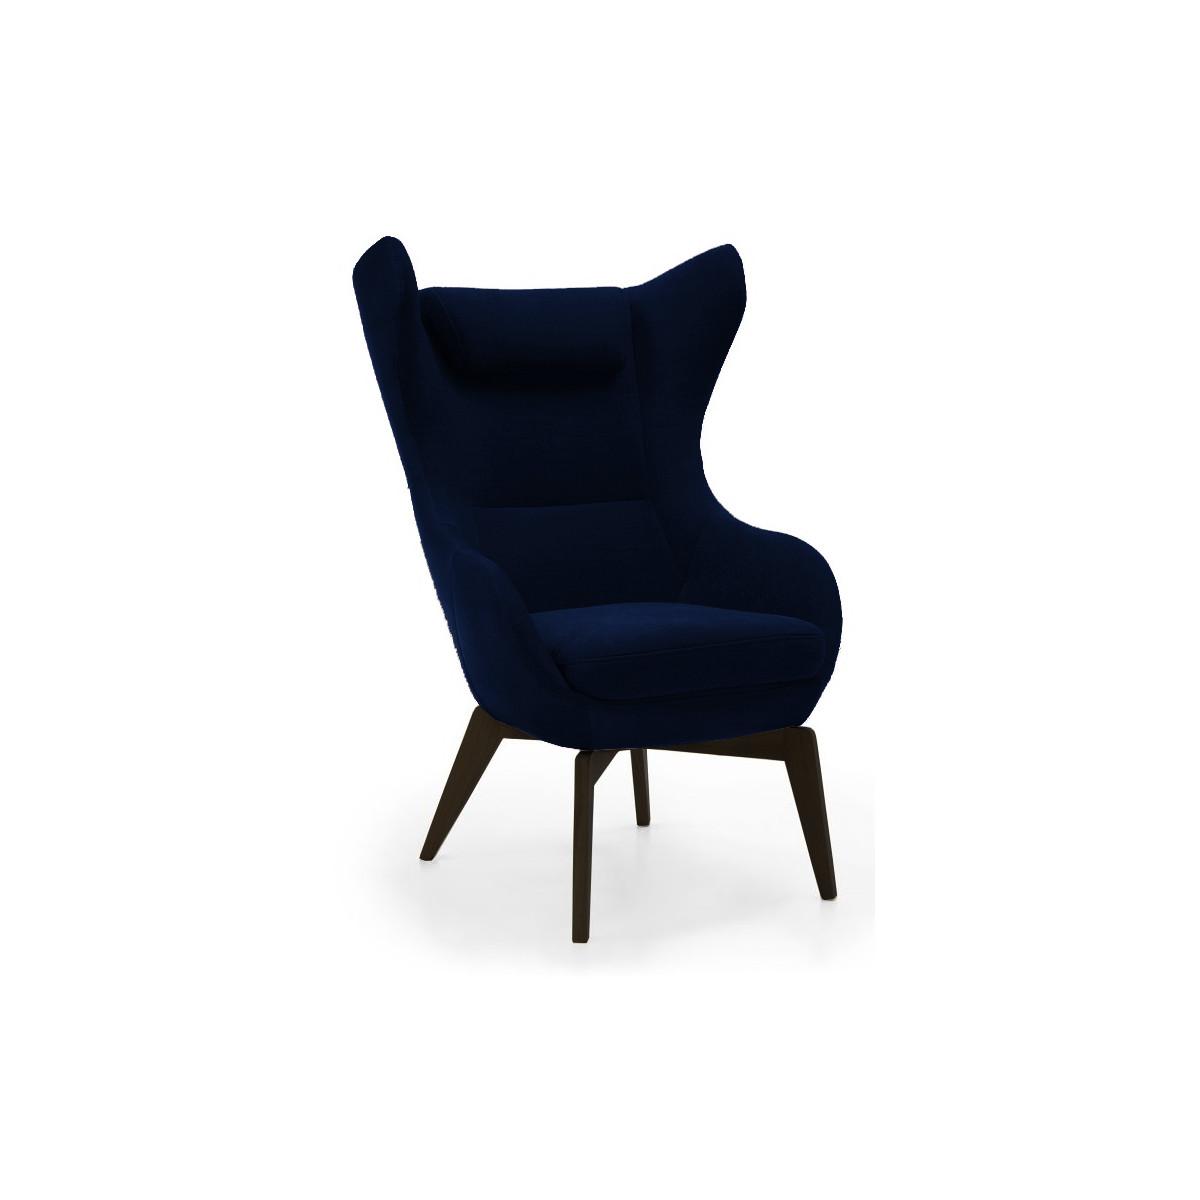 Zing II fotel uszak